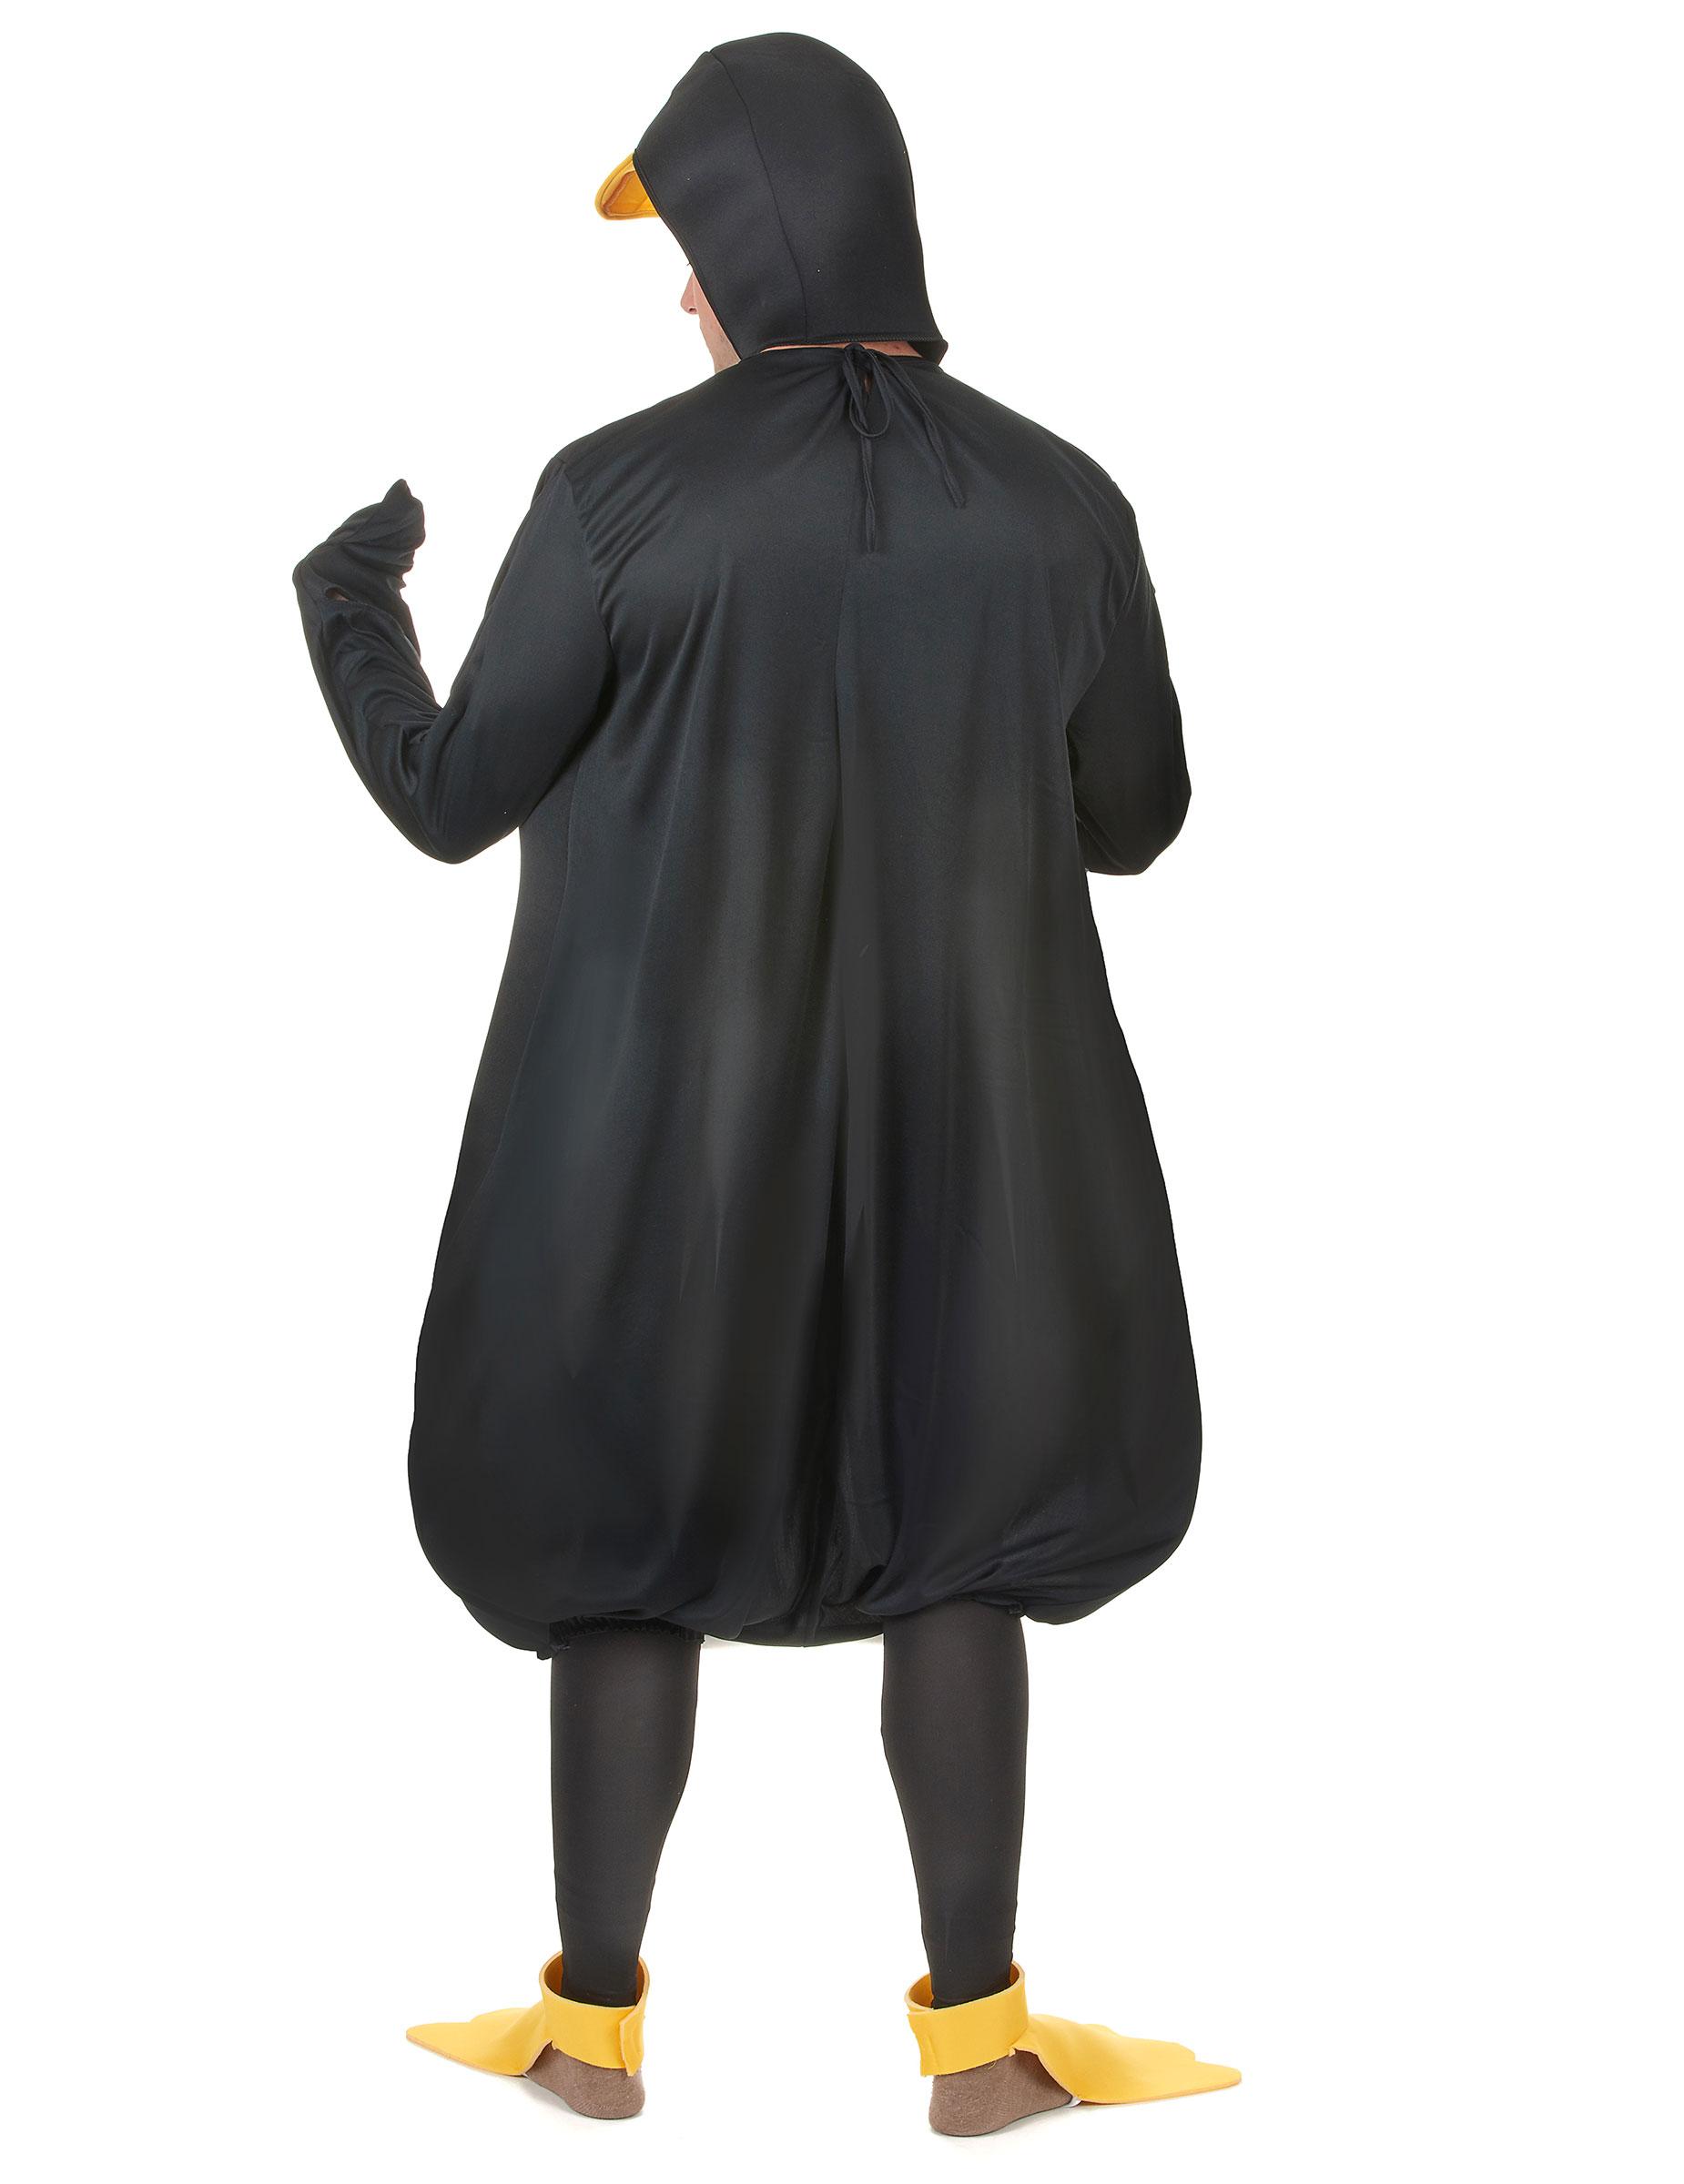 witziges pinguinkost m f r erwachsene kost me f r. Black Bedroom Furniture Sets. Home Design Ideas